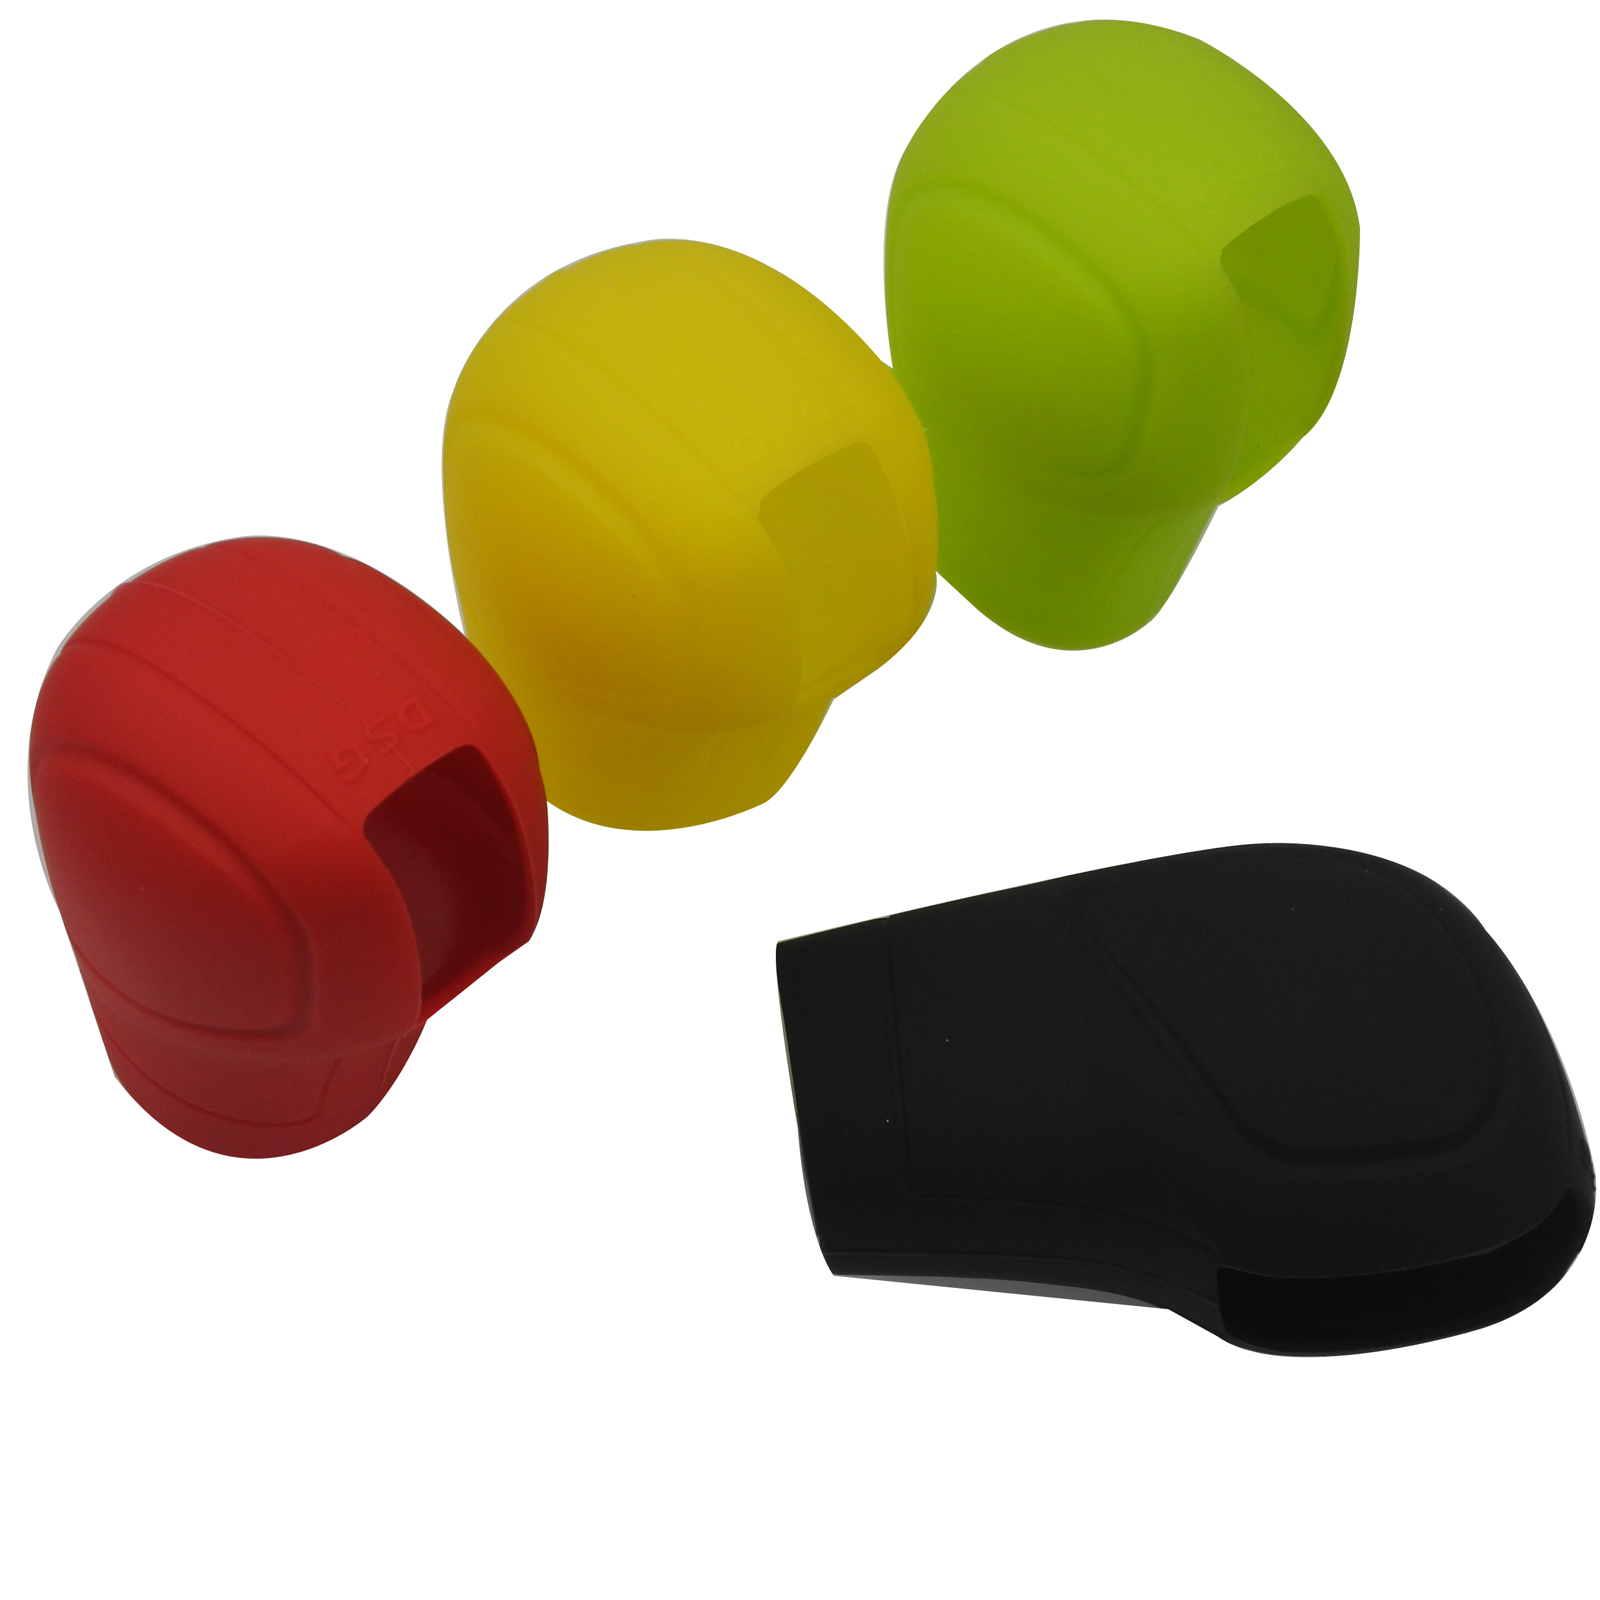 Handbrake-Grips Gear-Head-Shift-Knob-Cover Automatic Interior-Decoration New For Car